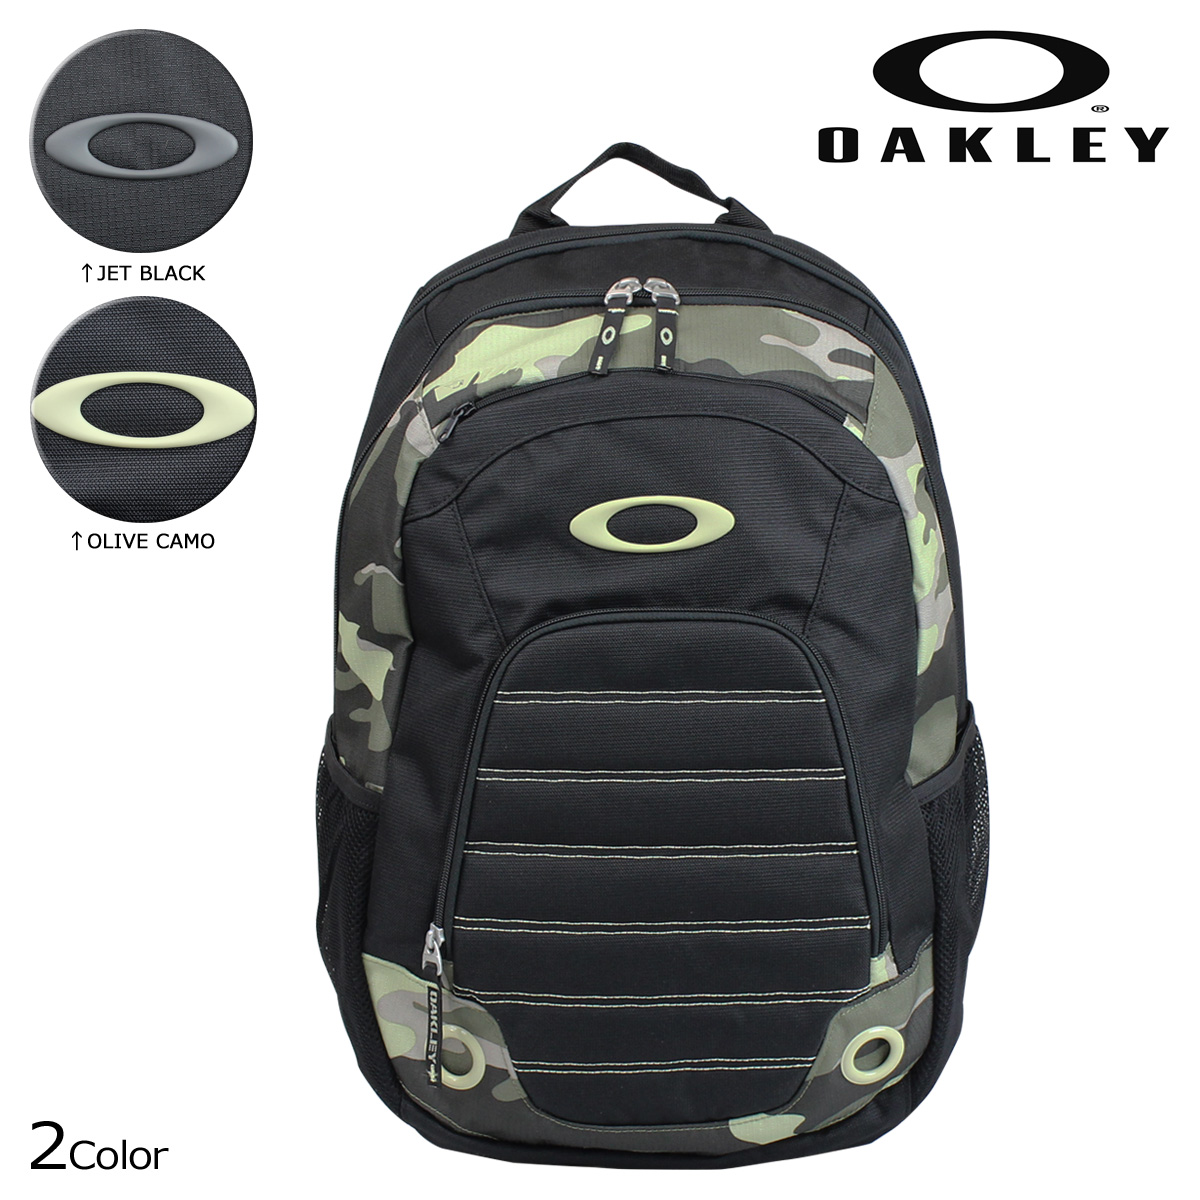 Sugar Online Oakley Mens Backpack Rucksack 92792 Gearbox 26 L 9 14 New In Stock Rakuten Global Market